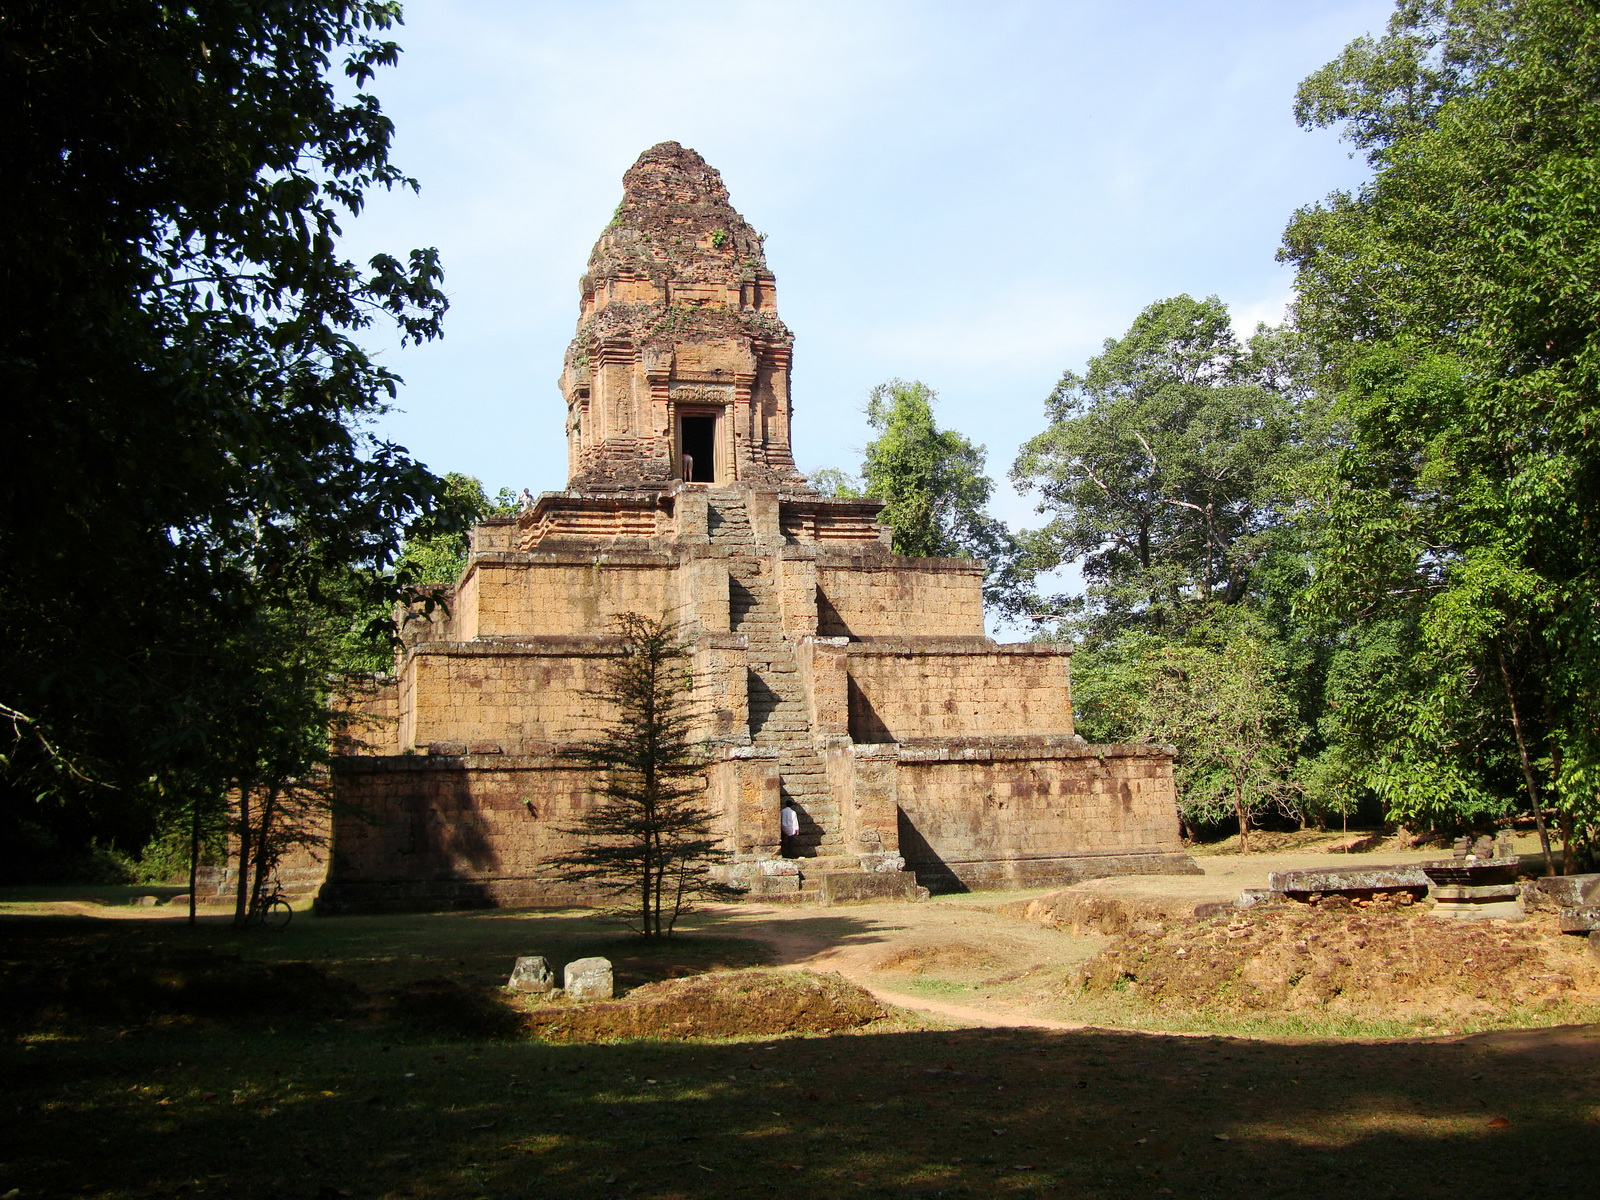 Baksei Chamkrong Temple Angkor Siem Reap Cambodia Jan 2010 10